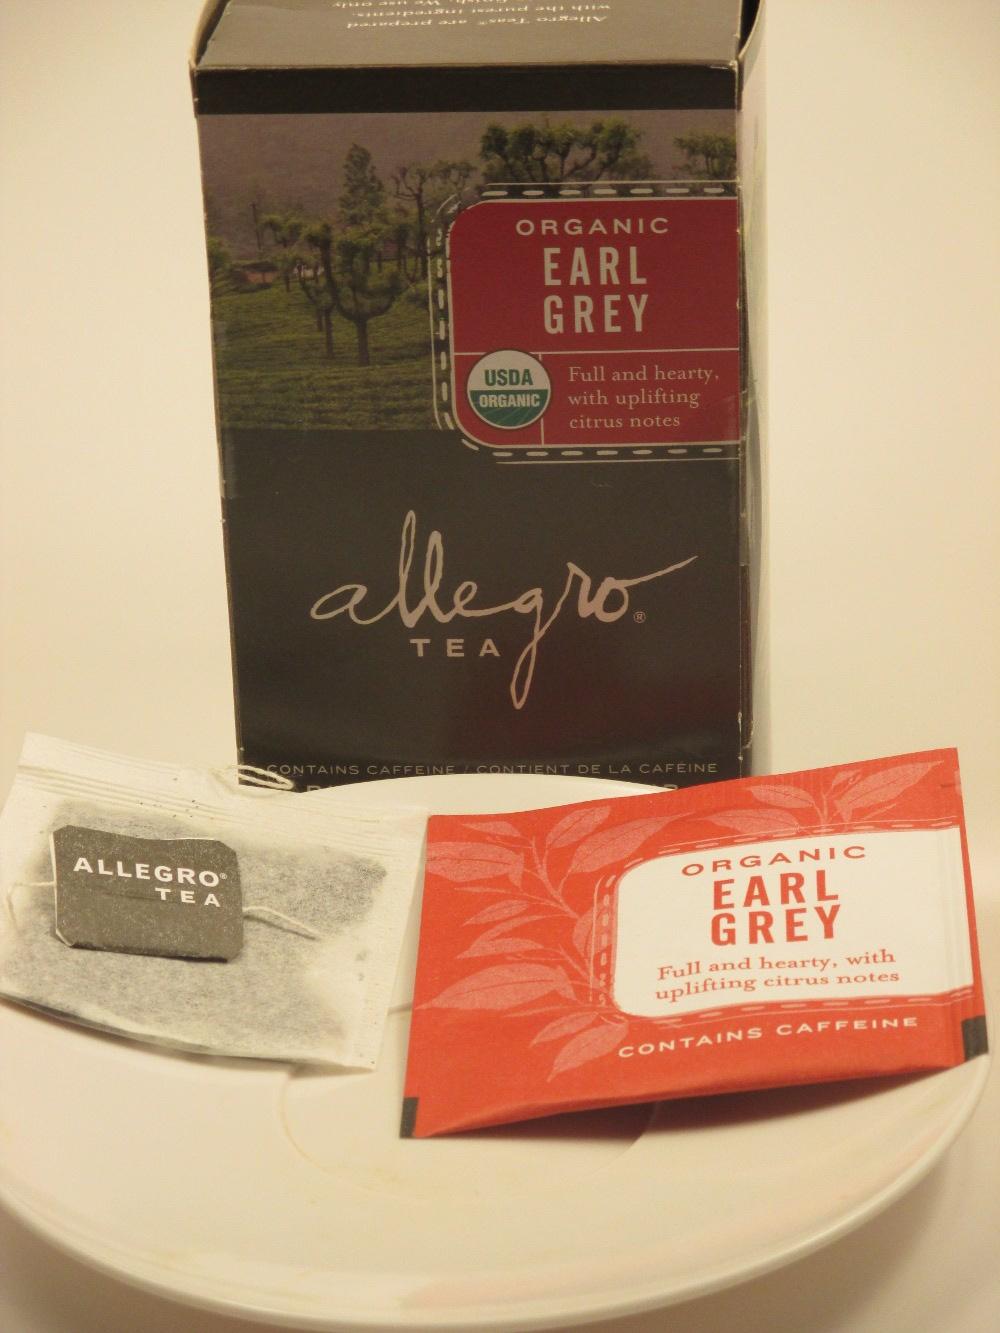 Allegro Tea Whole Foods